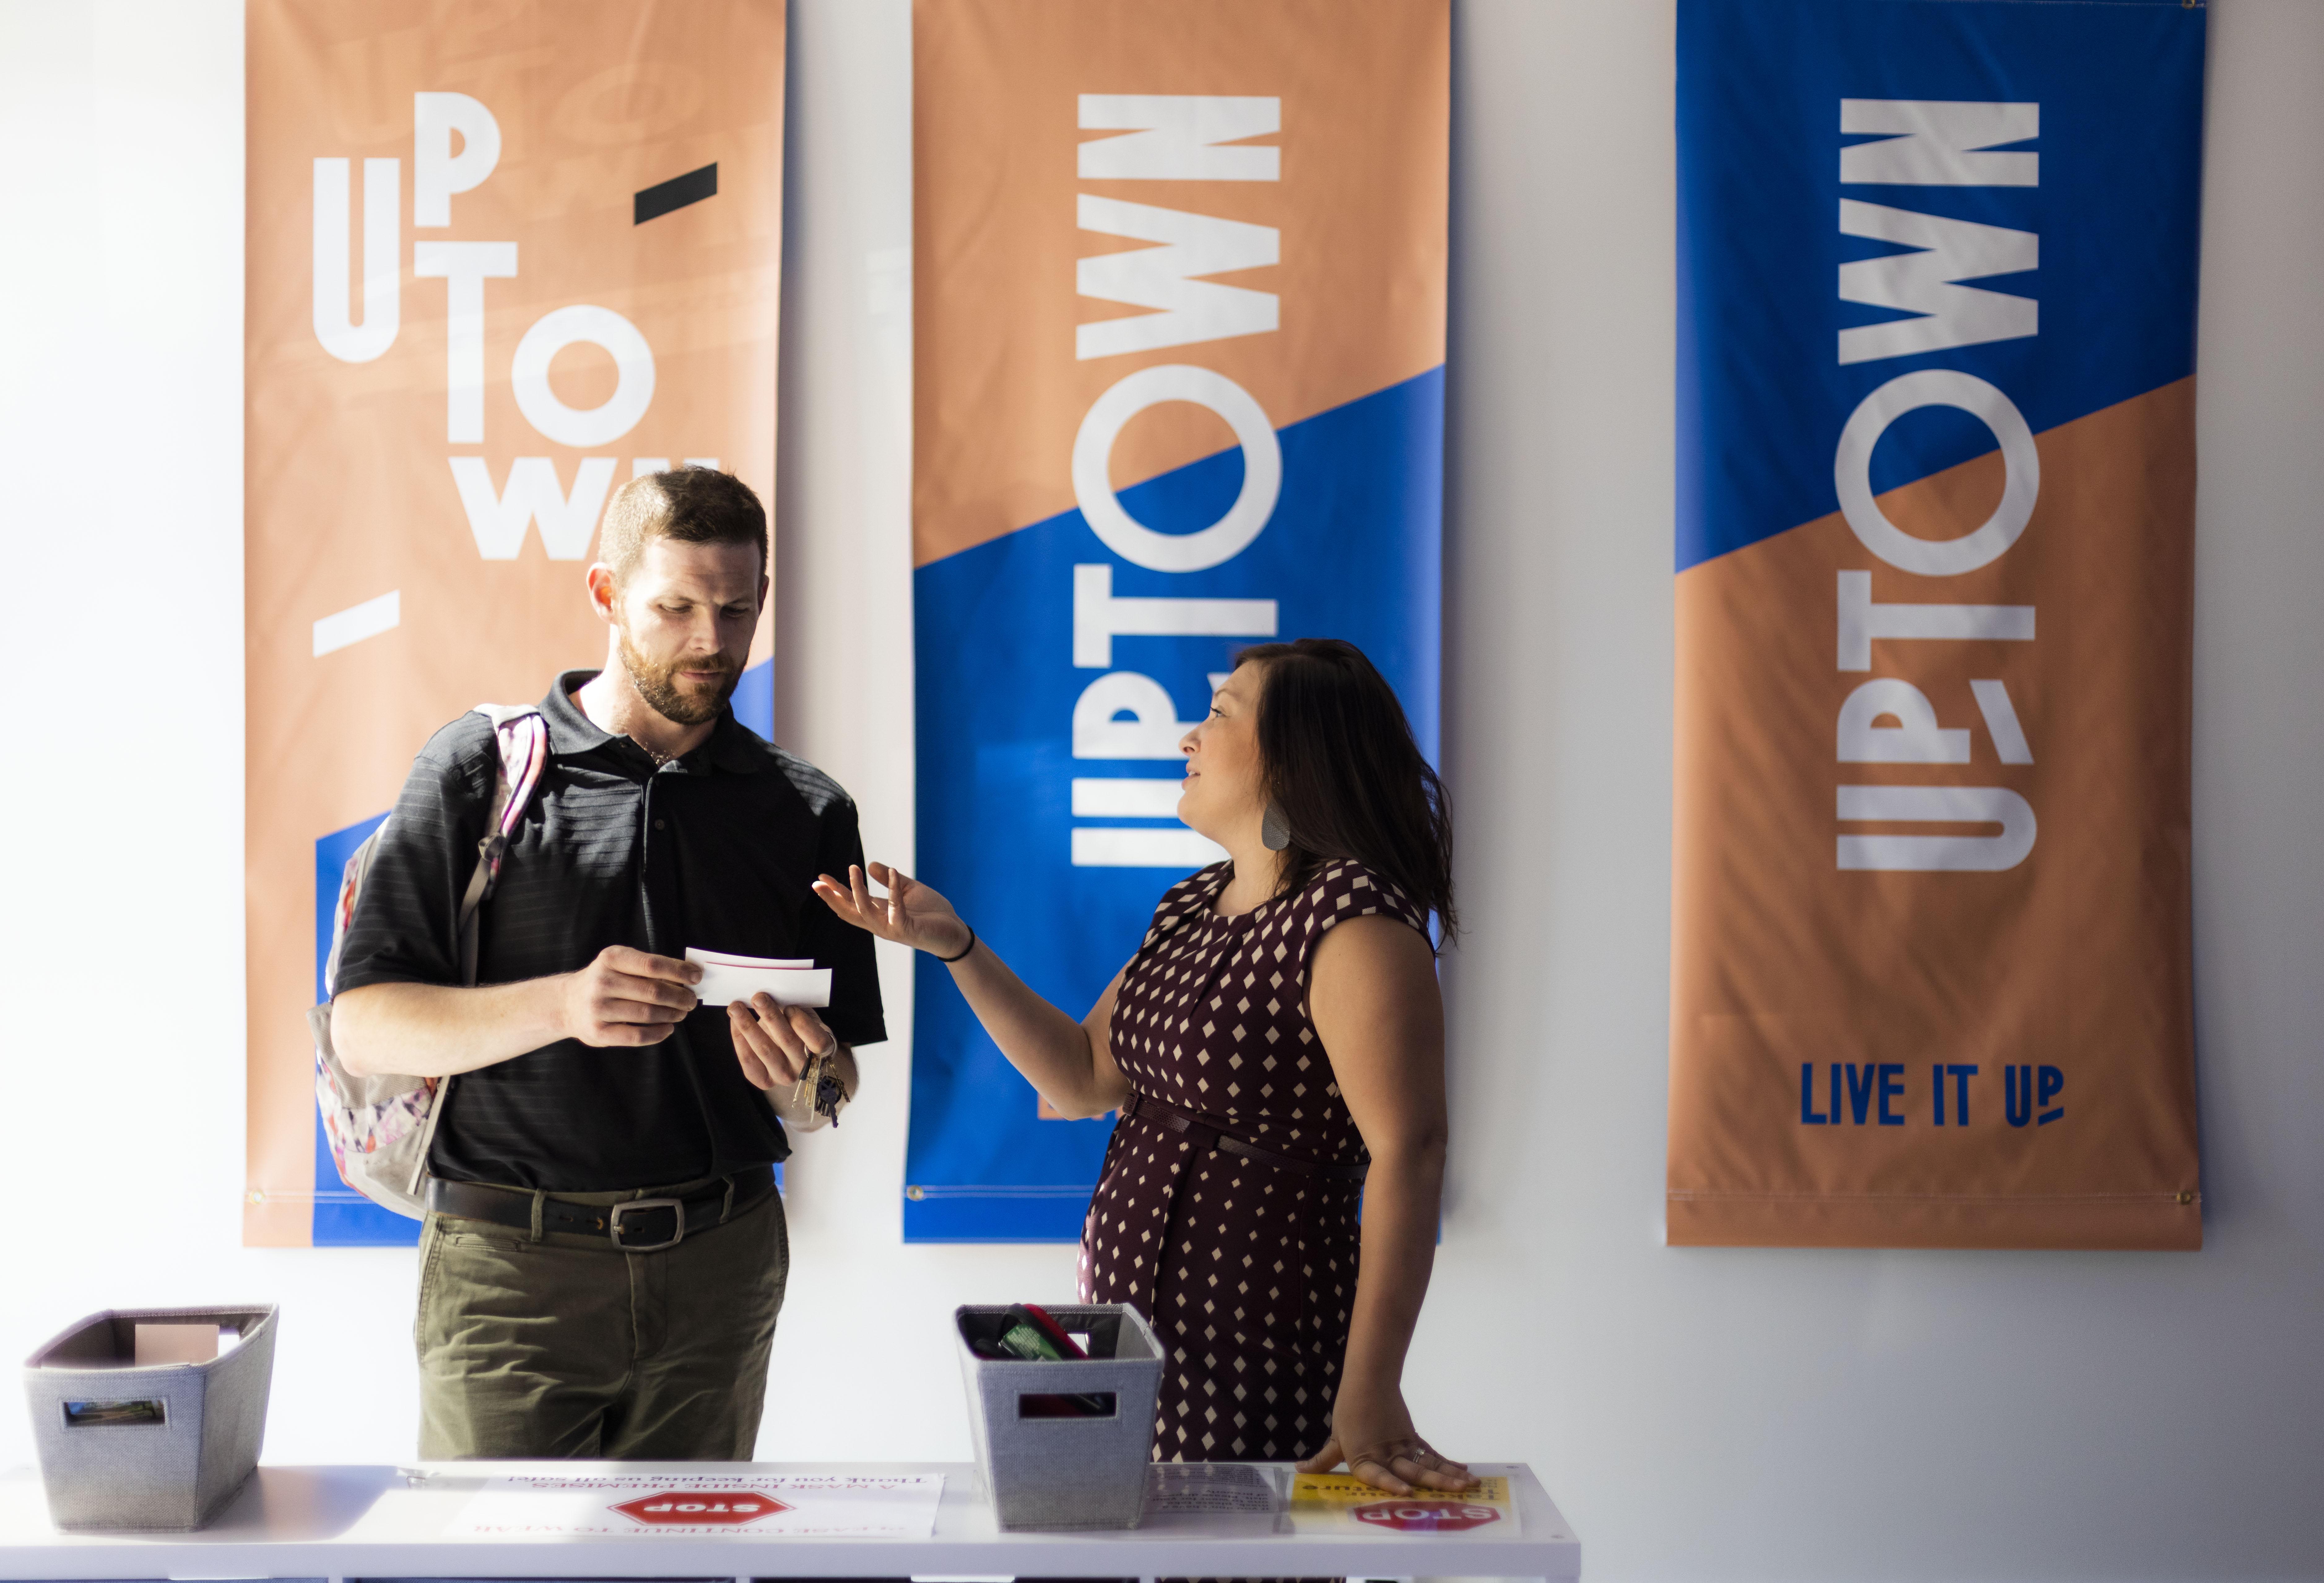 Uptown Business Center: Licensing Basics